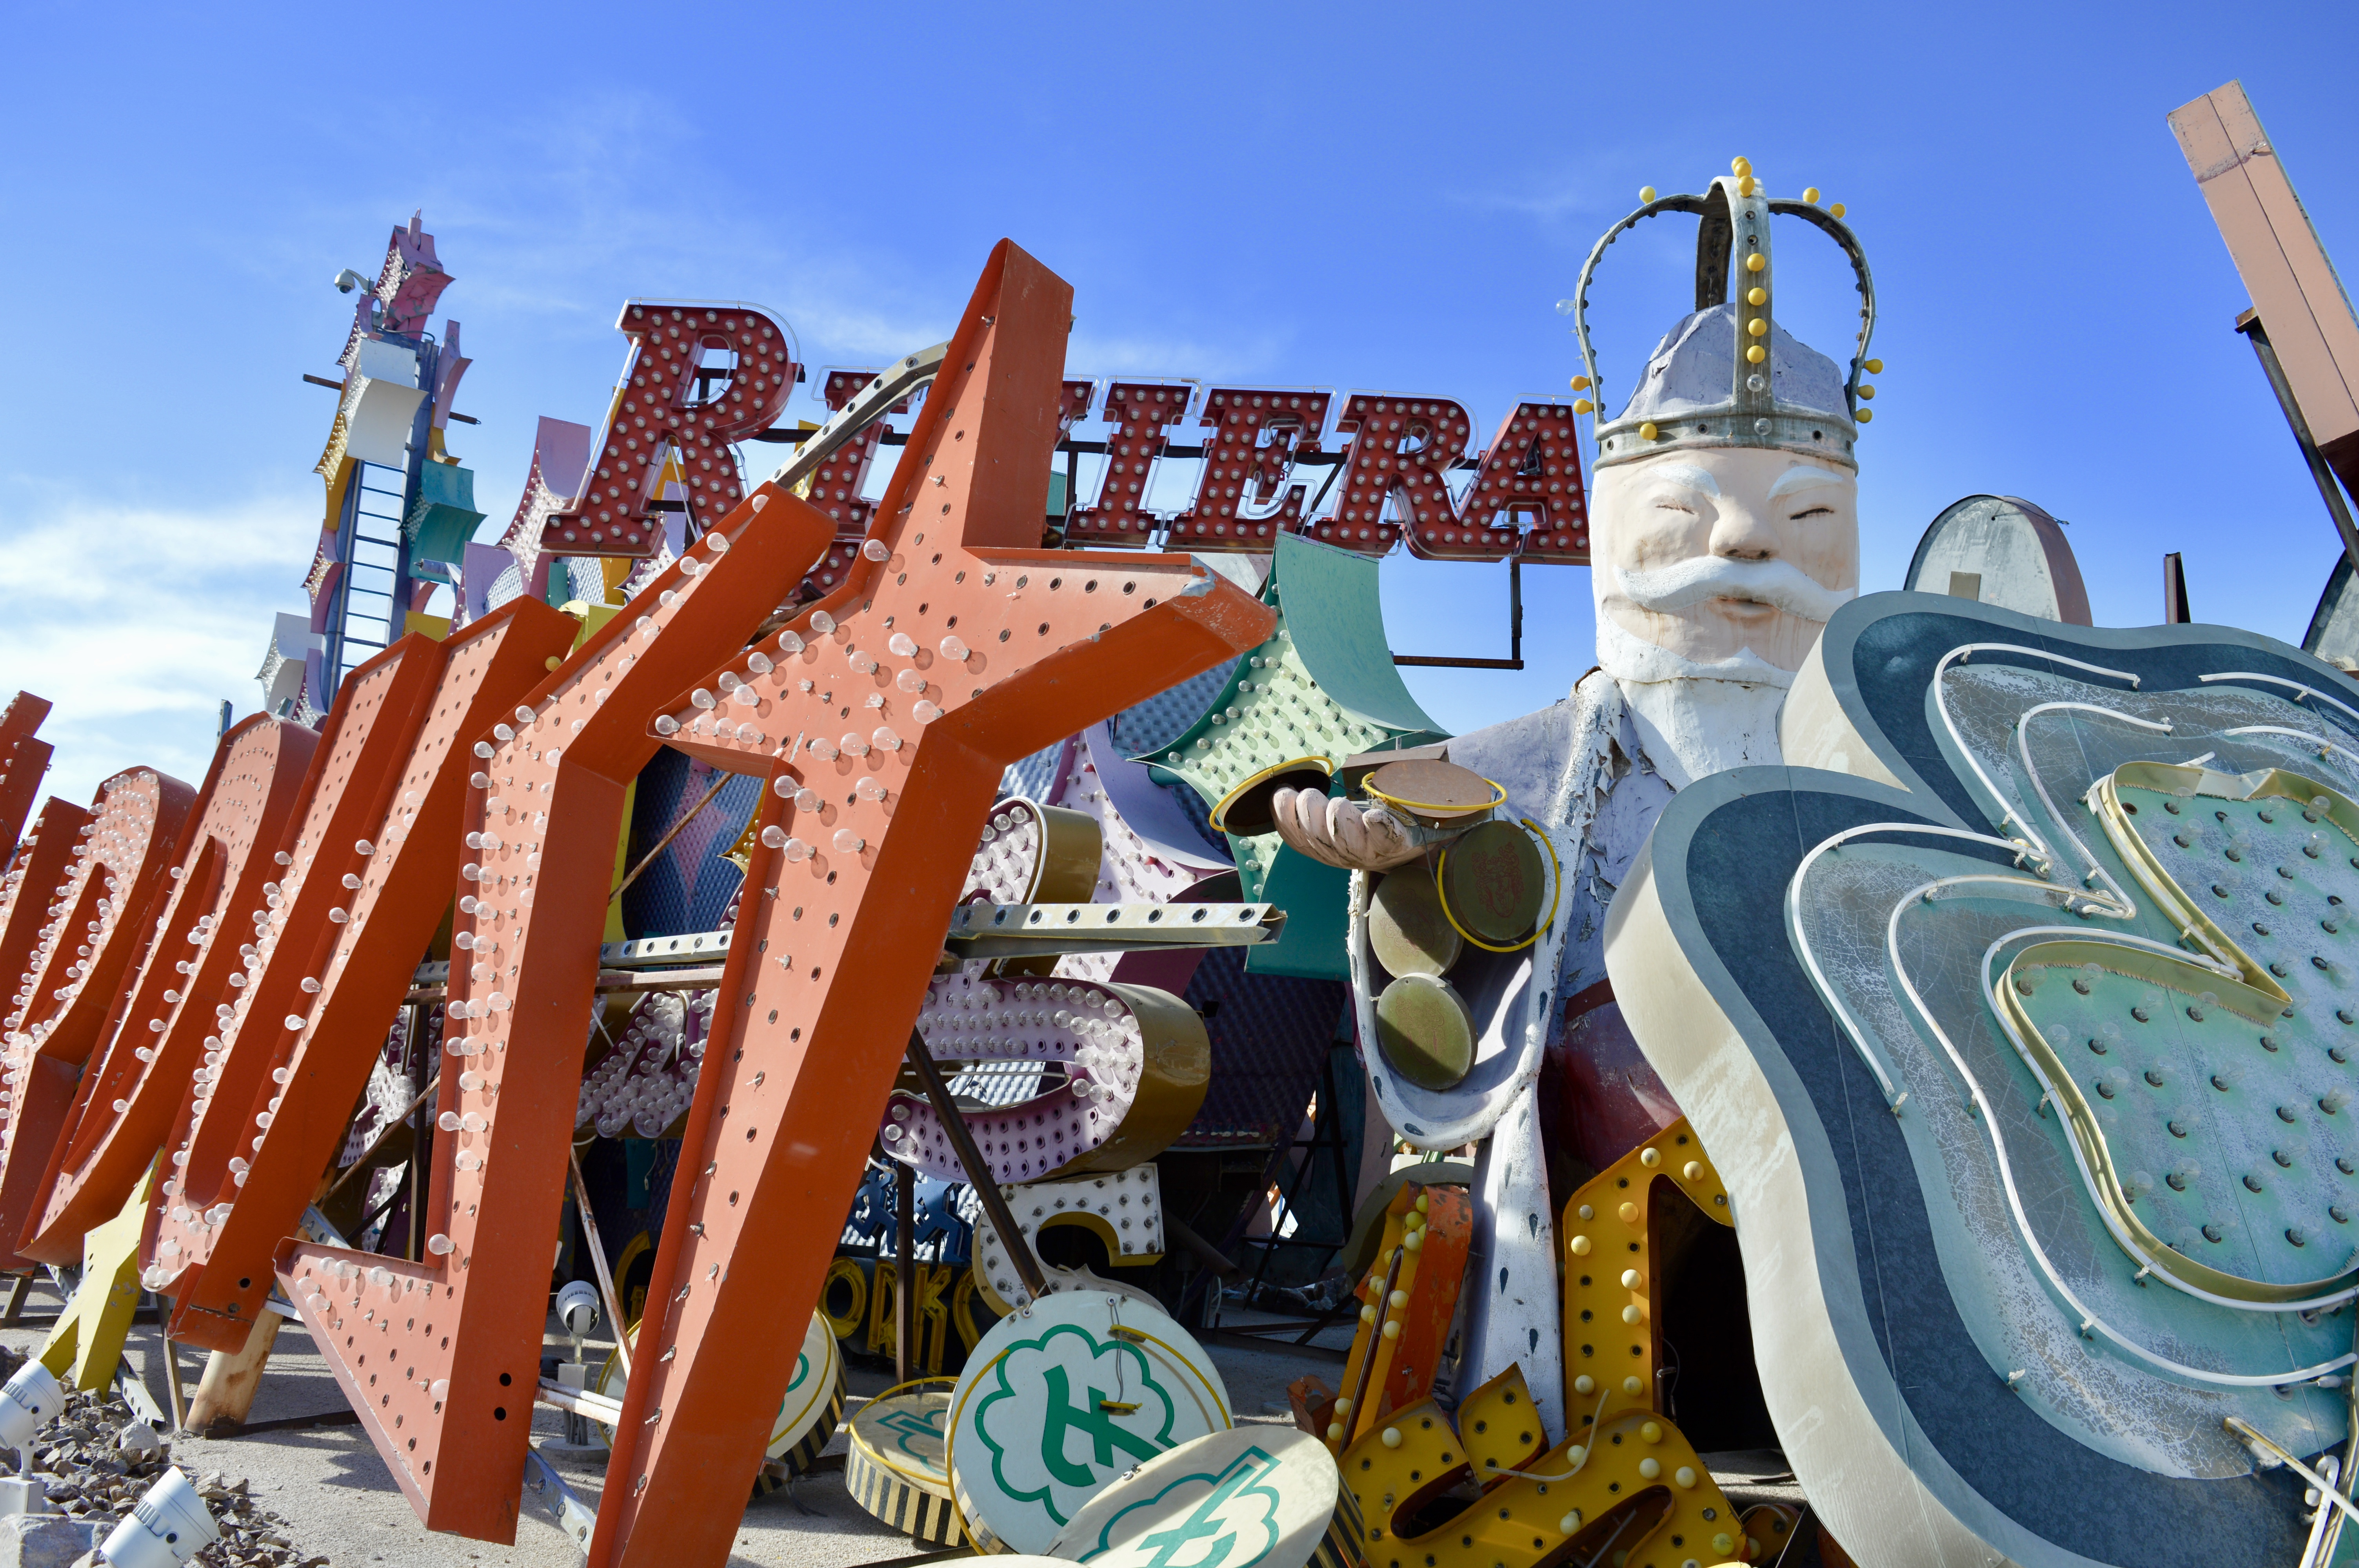 The Riviera | The Neon Boneyard Museum | Las Vegas | What should I do in Las Vegas? | Travel tips for Las Vegas Nevada | Travel Blog | Elle Blonde Luxury Lifestyle Destination Blog